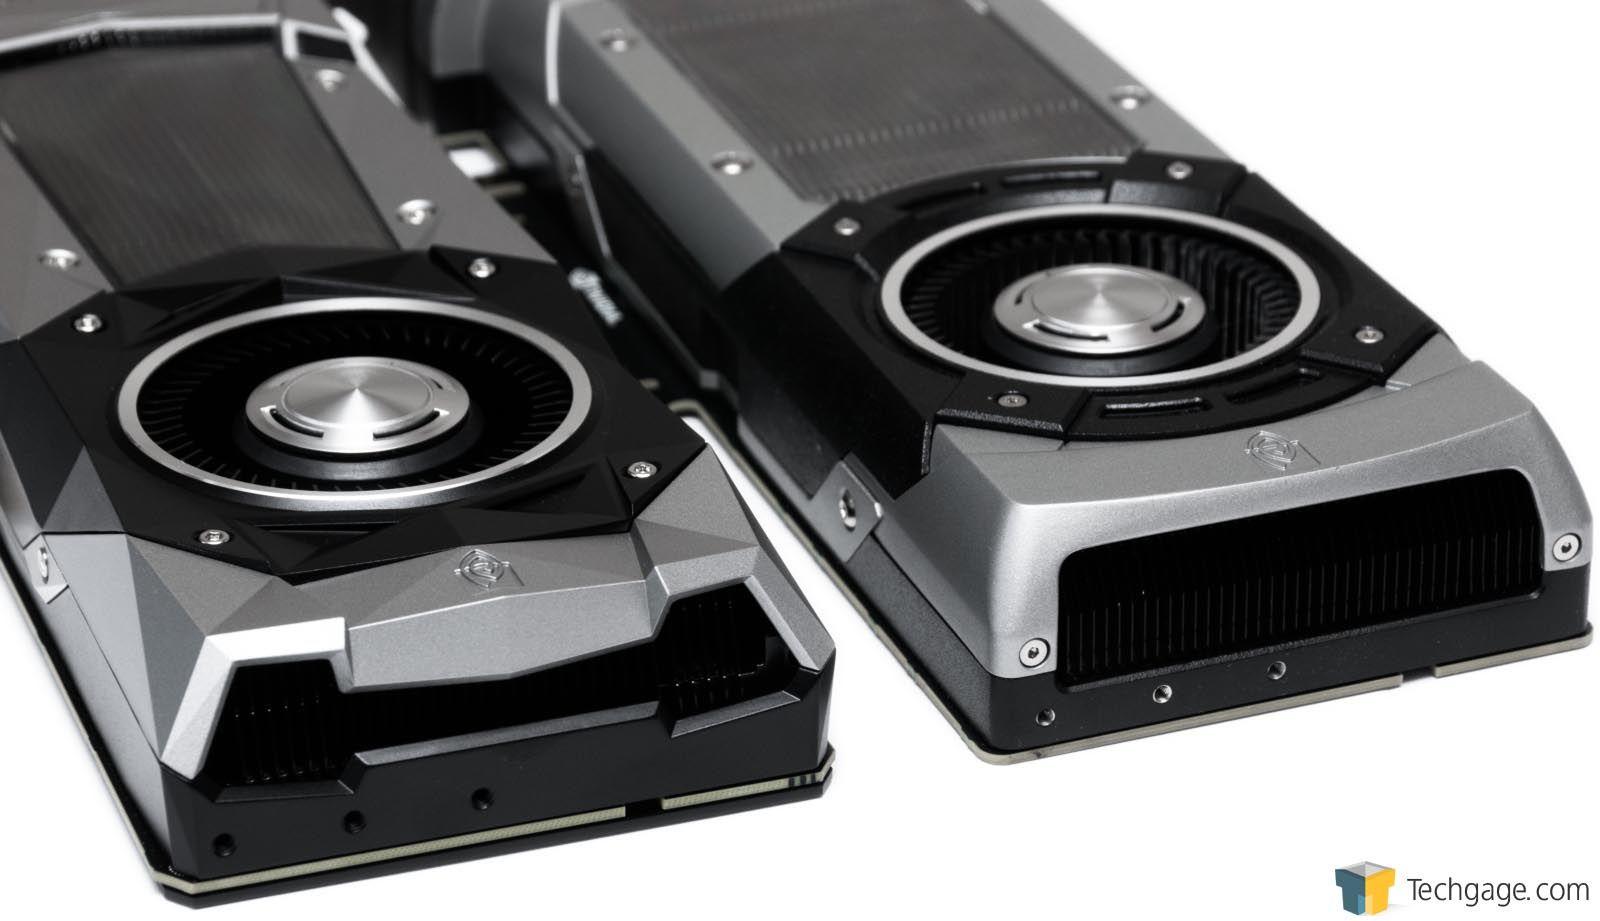 NVIDIA-GeForce-GTX-1080-GTX-980-Ti-Coolers | Gaming